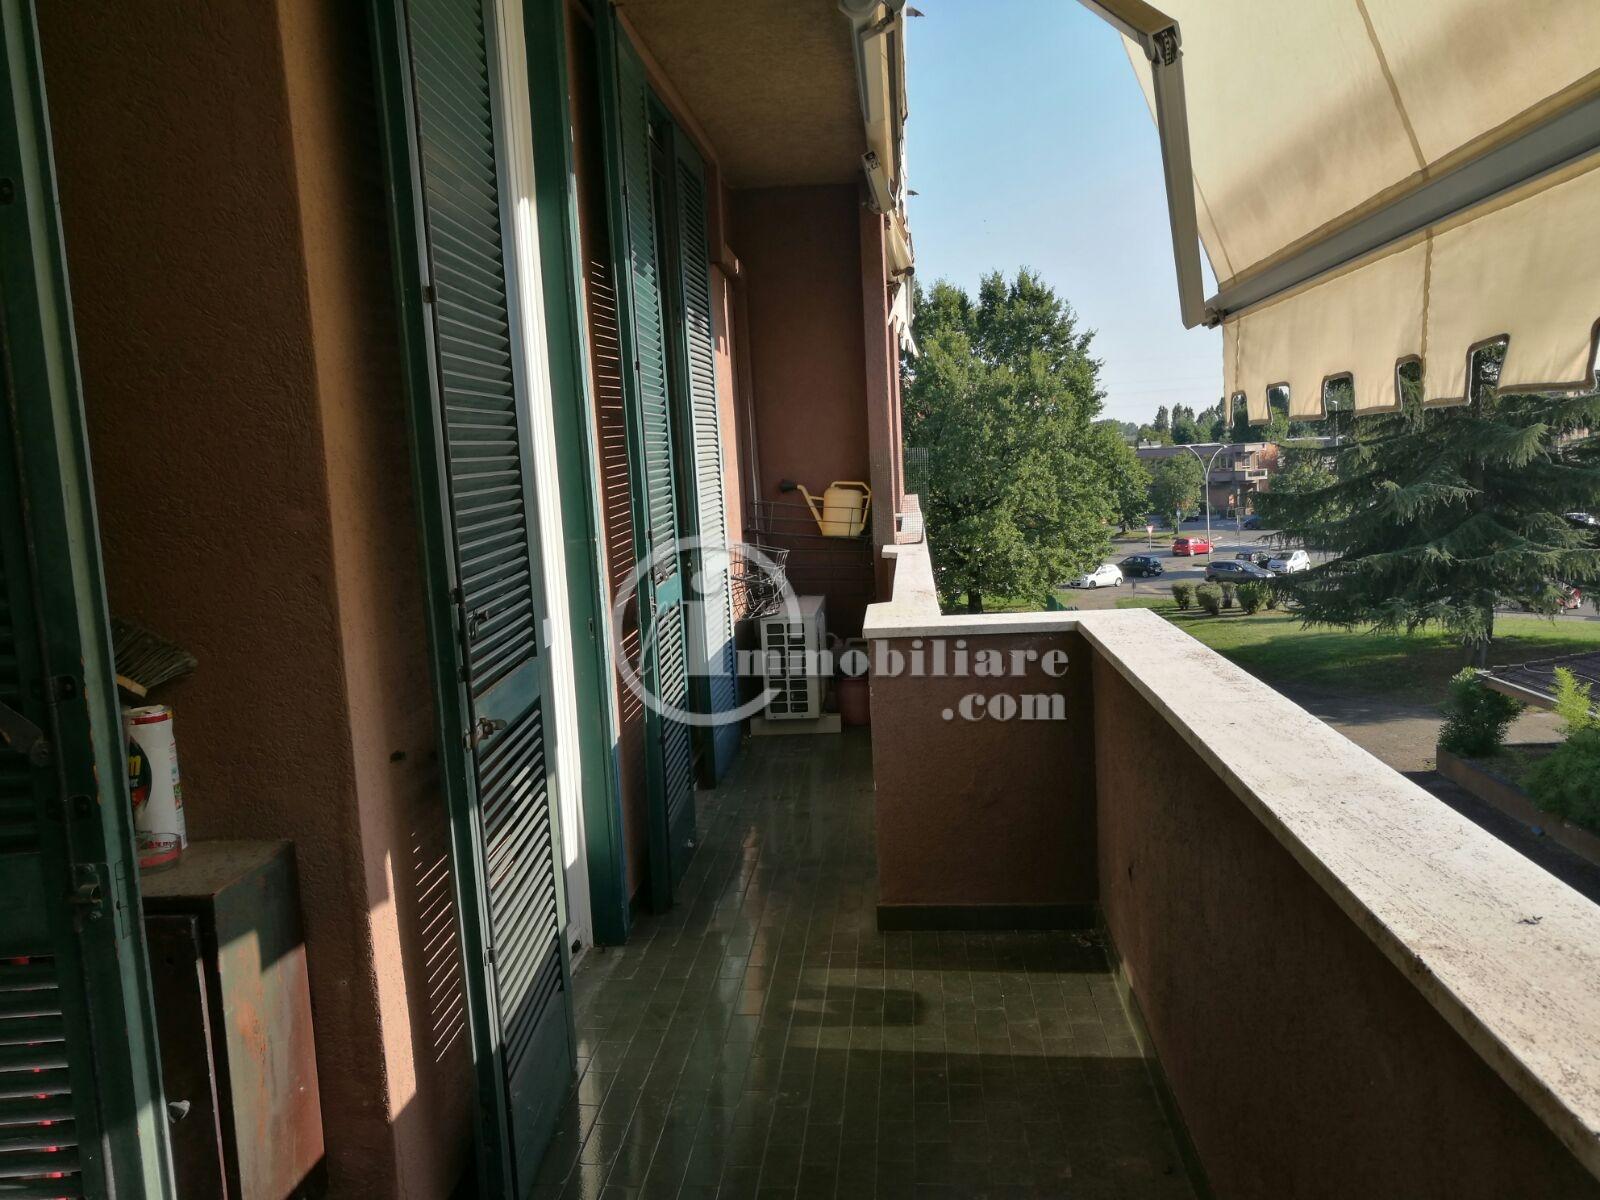 Buccinasco | Appartamento in Vendita in Appartamento | lacasadimilano.it